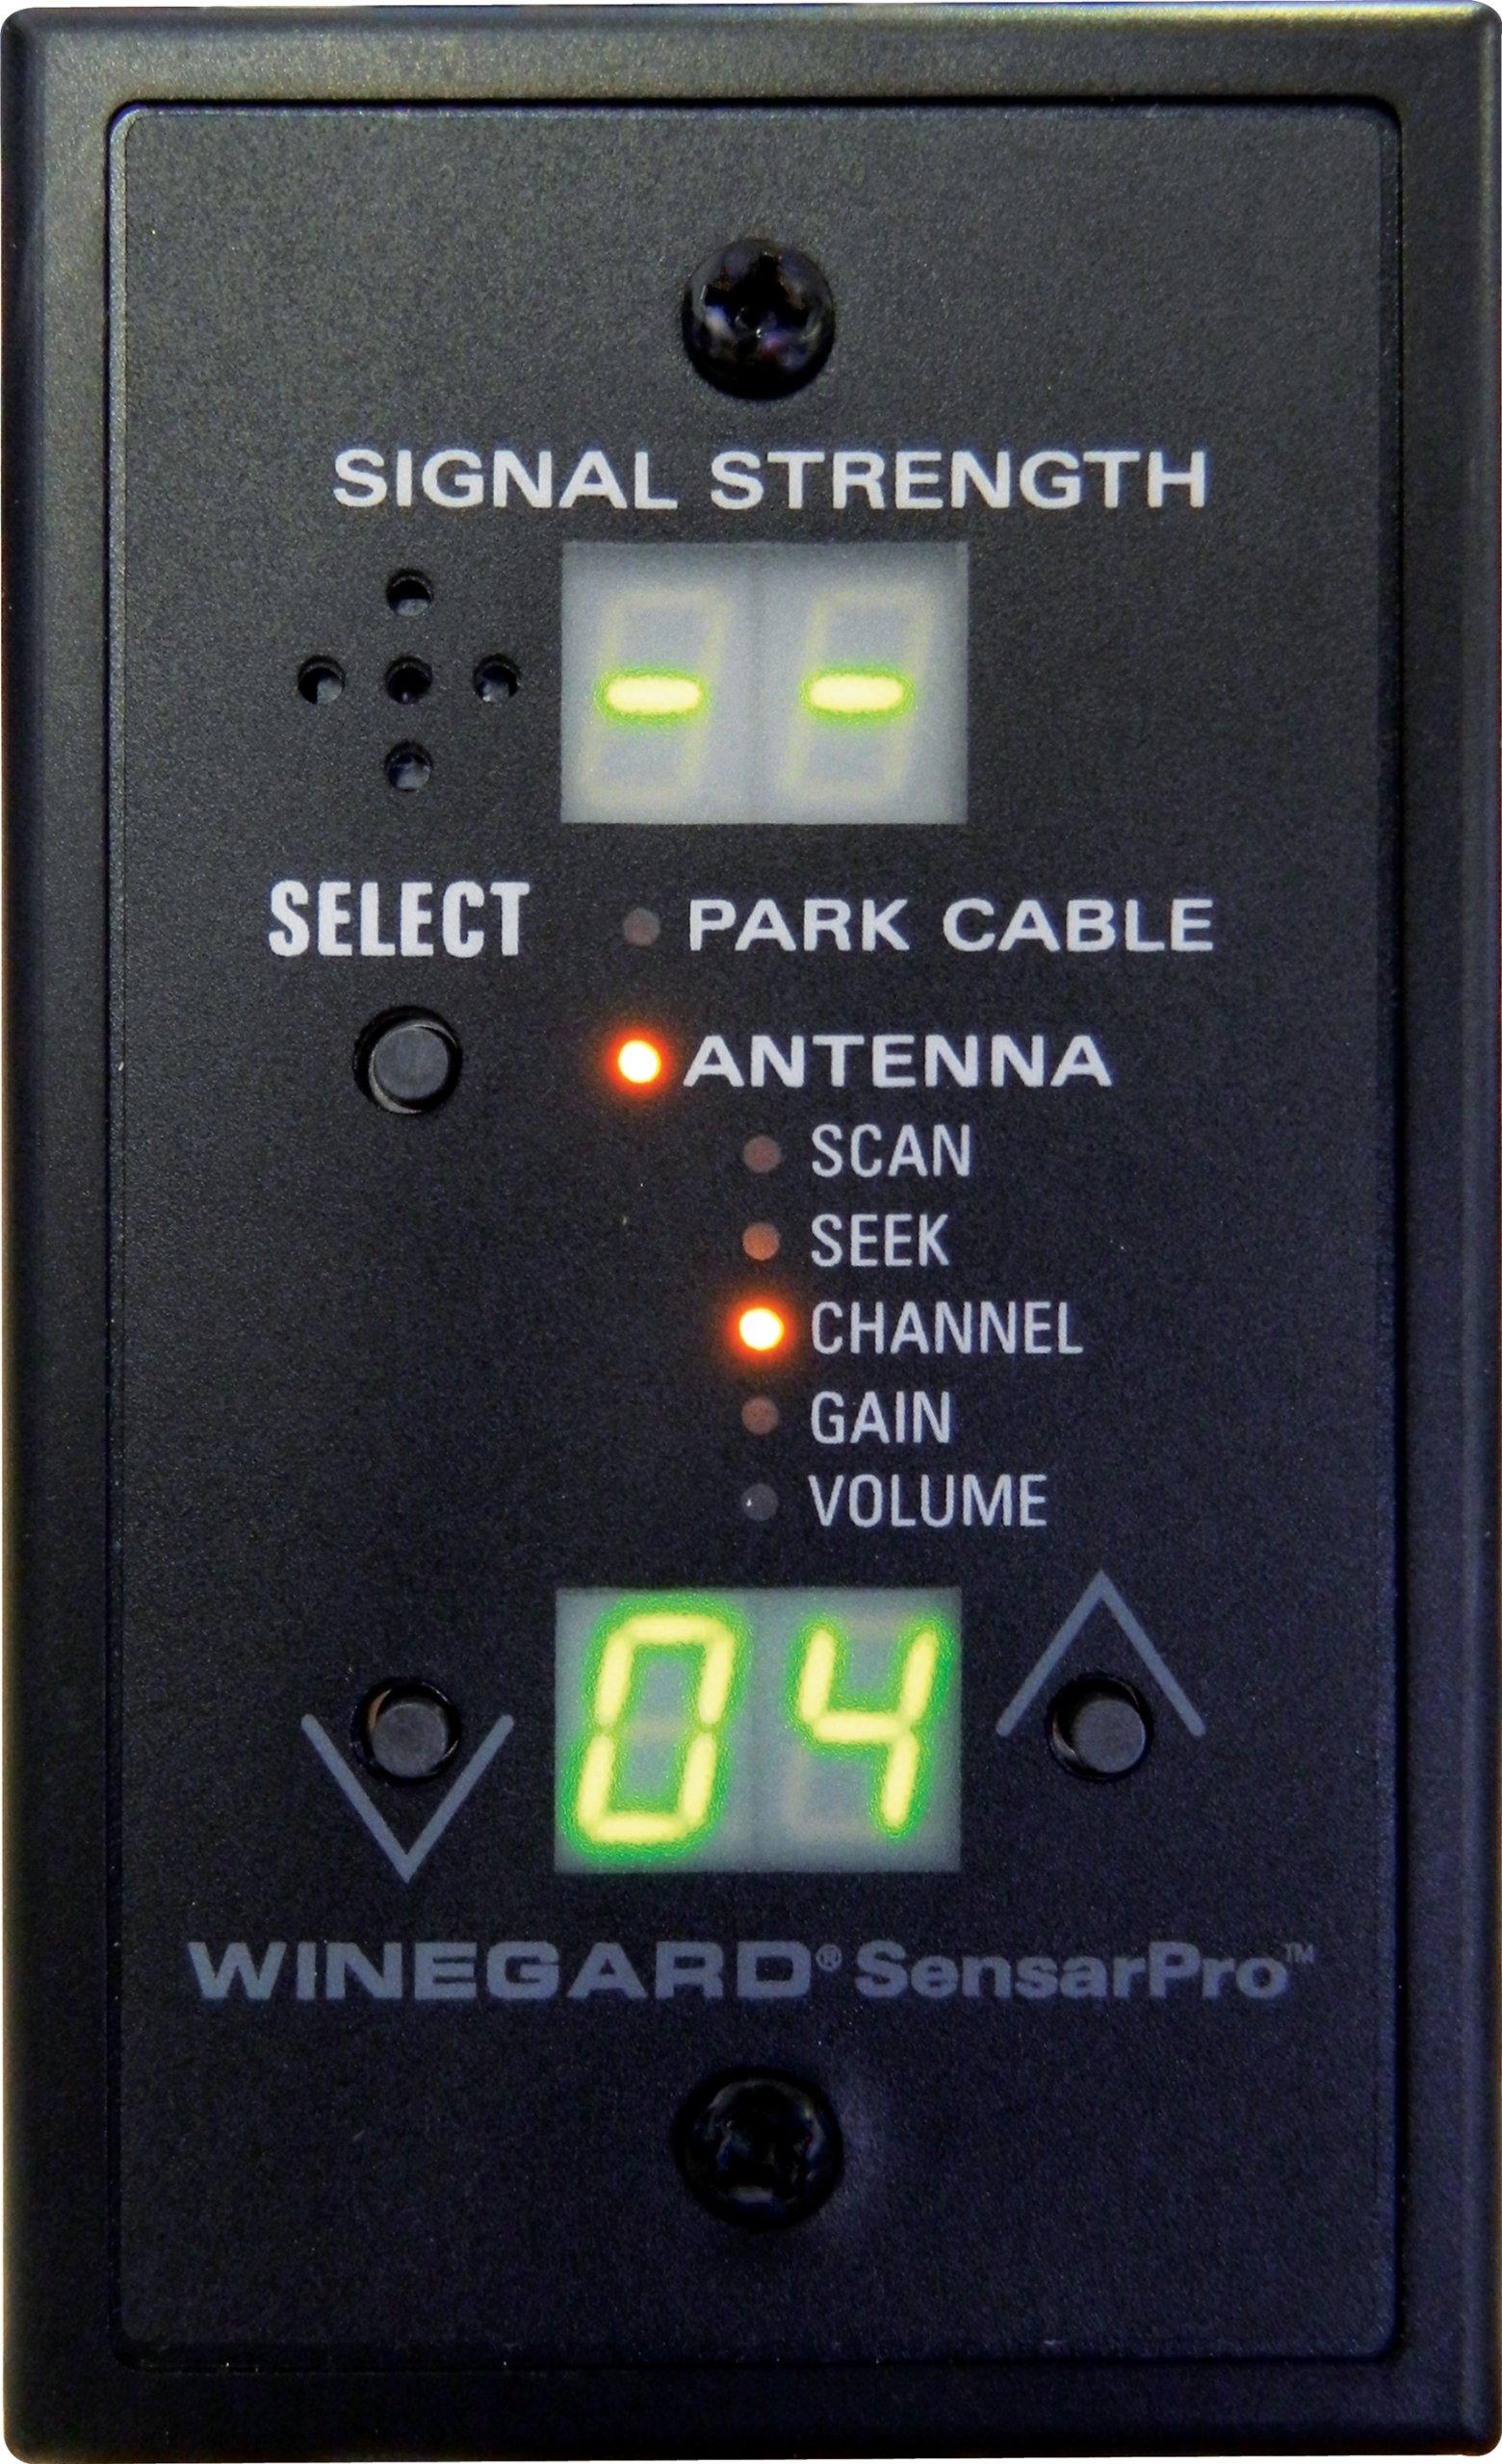 Winegard RFL 332 SensarPro Signal Strength